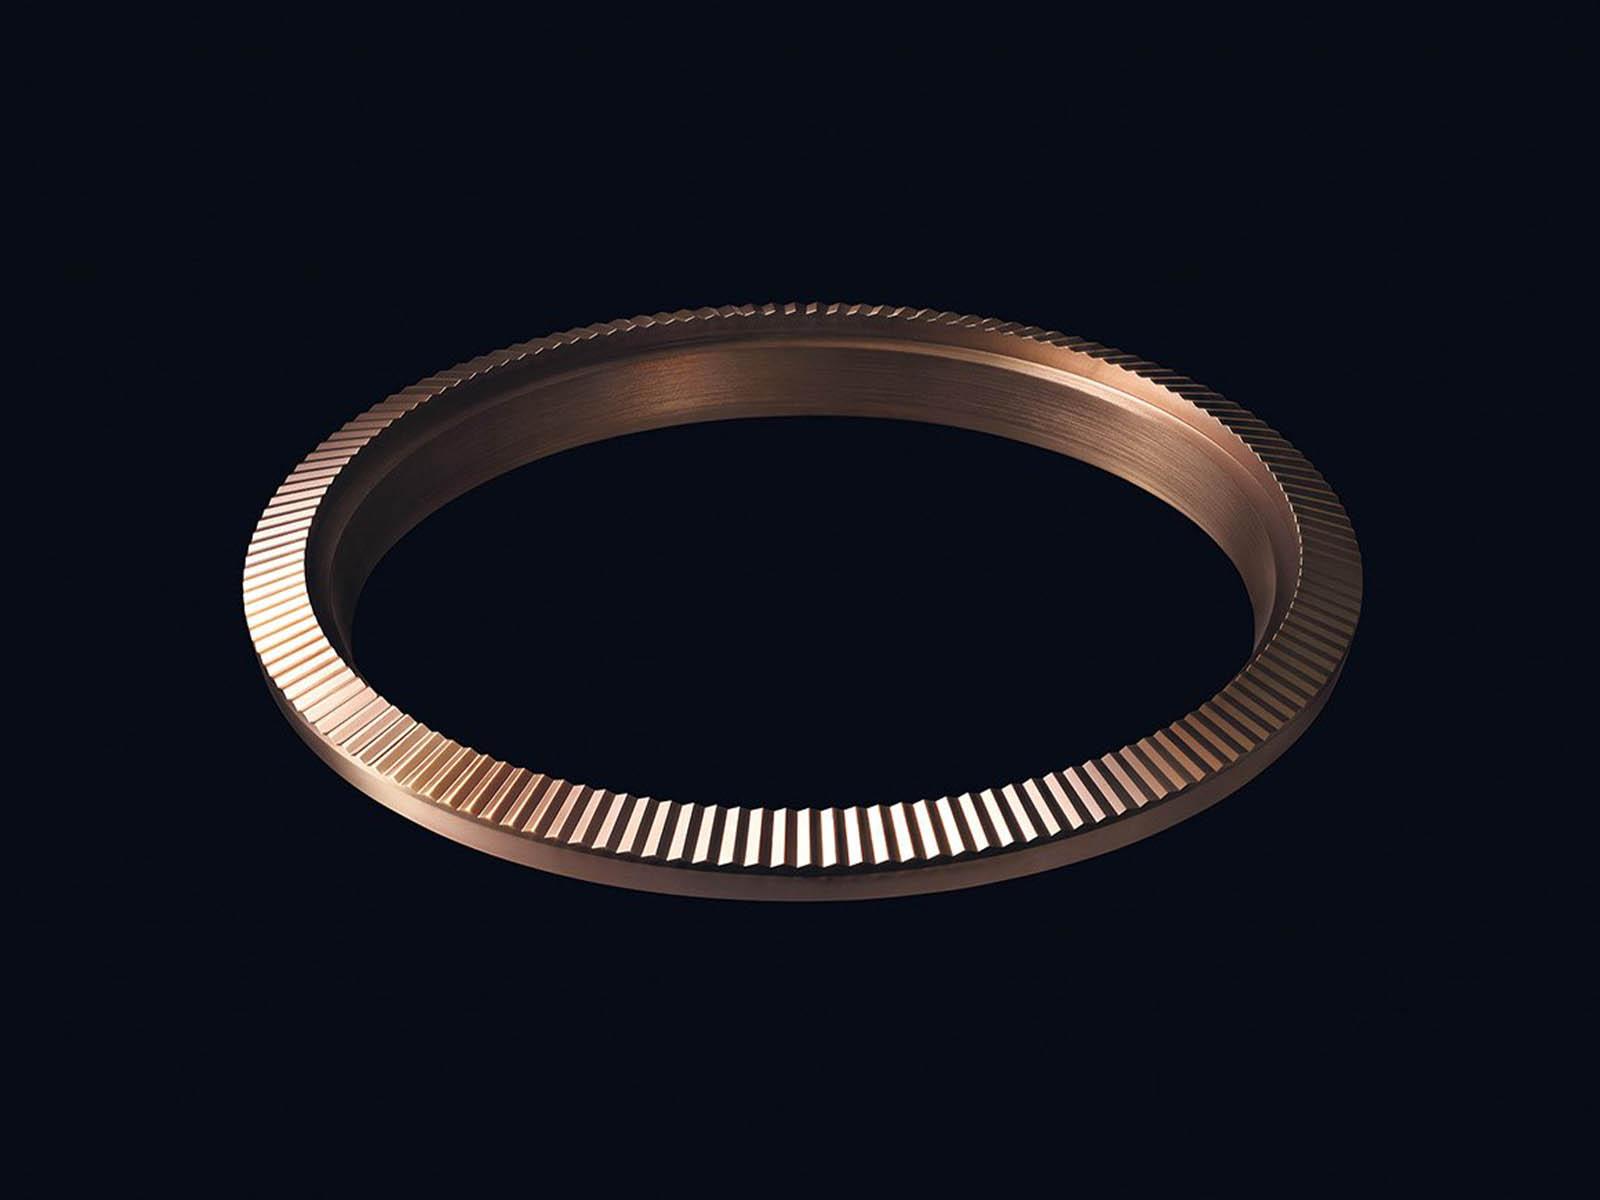 omega-seamaster-diver-300m-chronograph-gold-titanium-tantalum-12.jpg